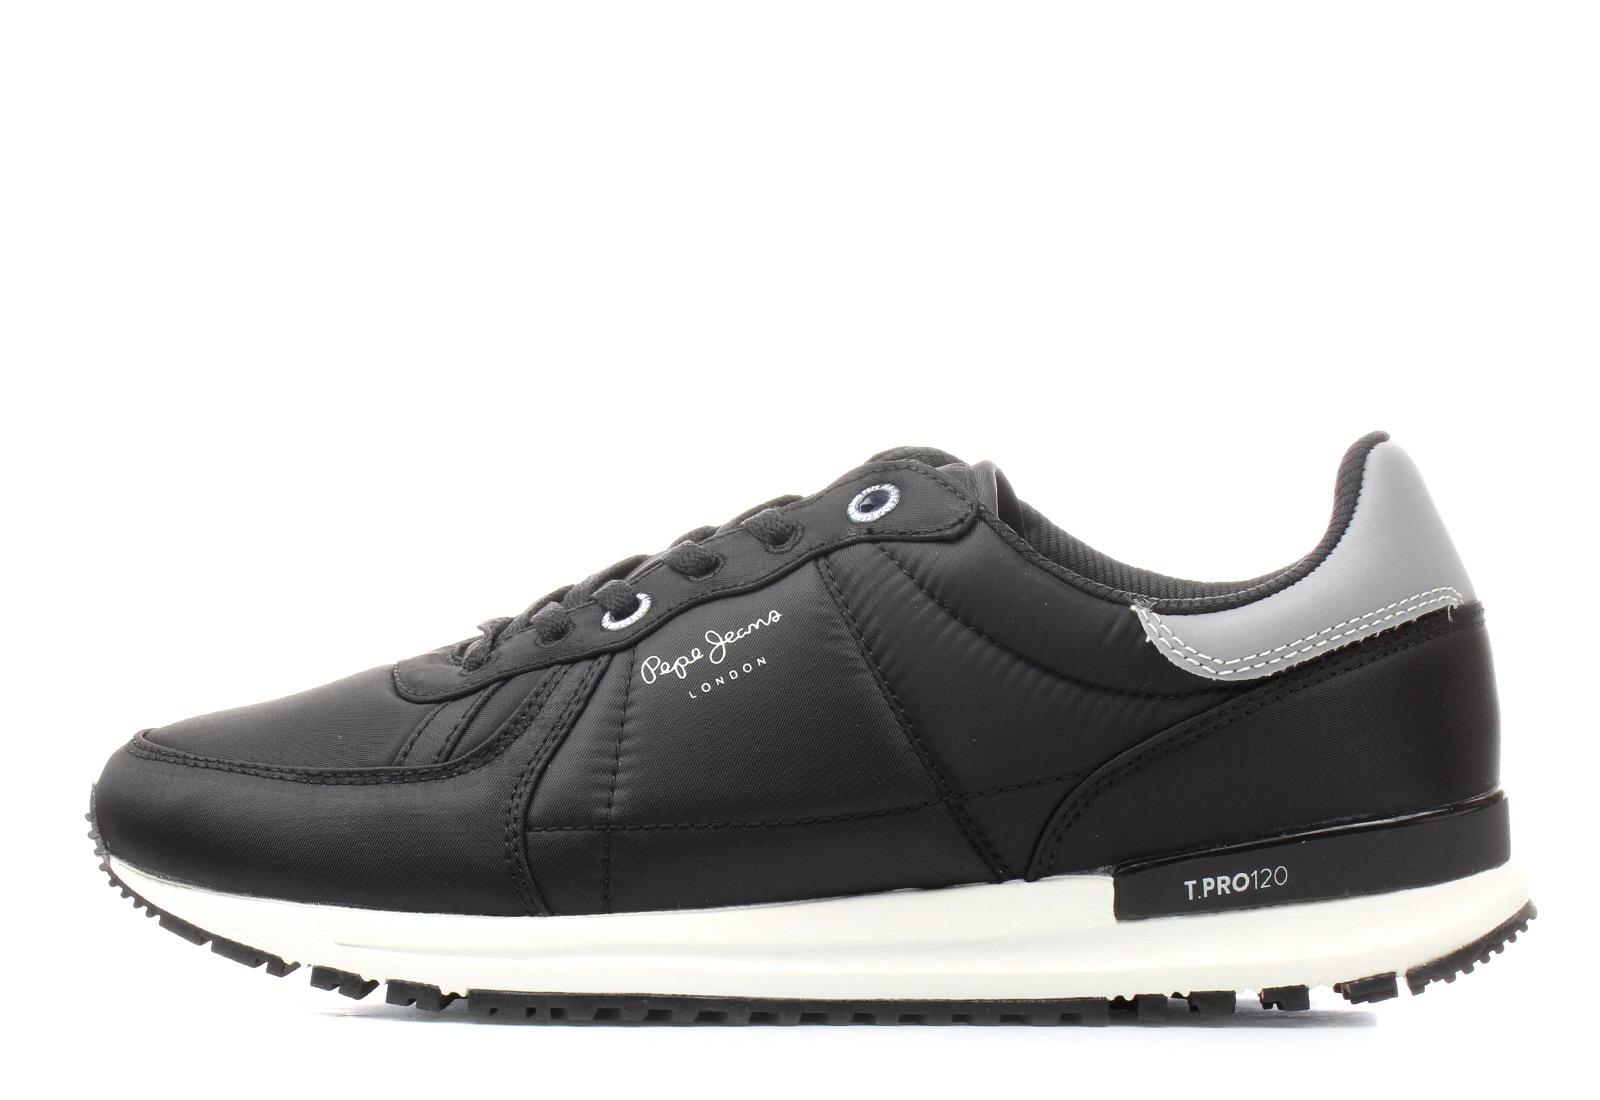 9de8613392 Office Office Pepe Jeans Cipő Magyarország Shoes PMS30486999 Tinker rIIF8a